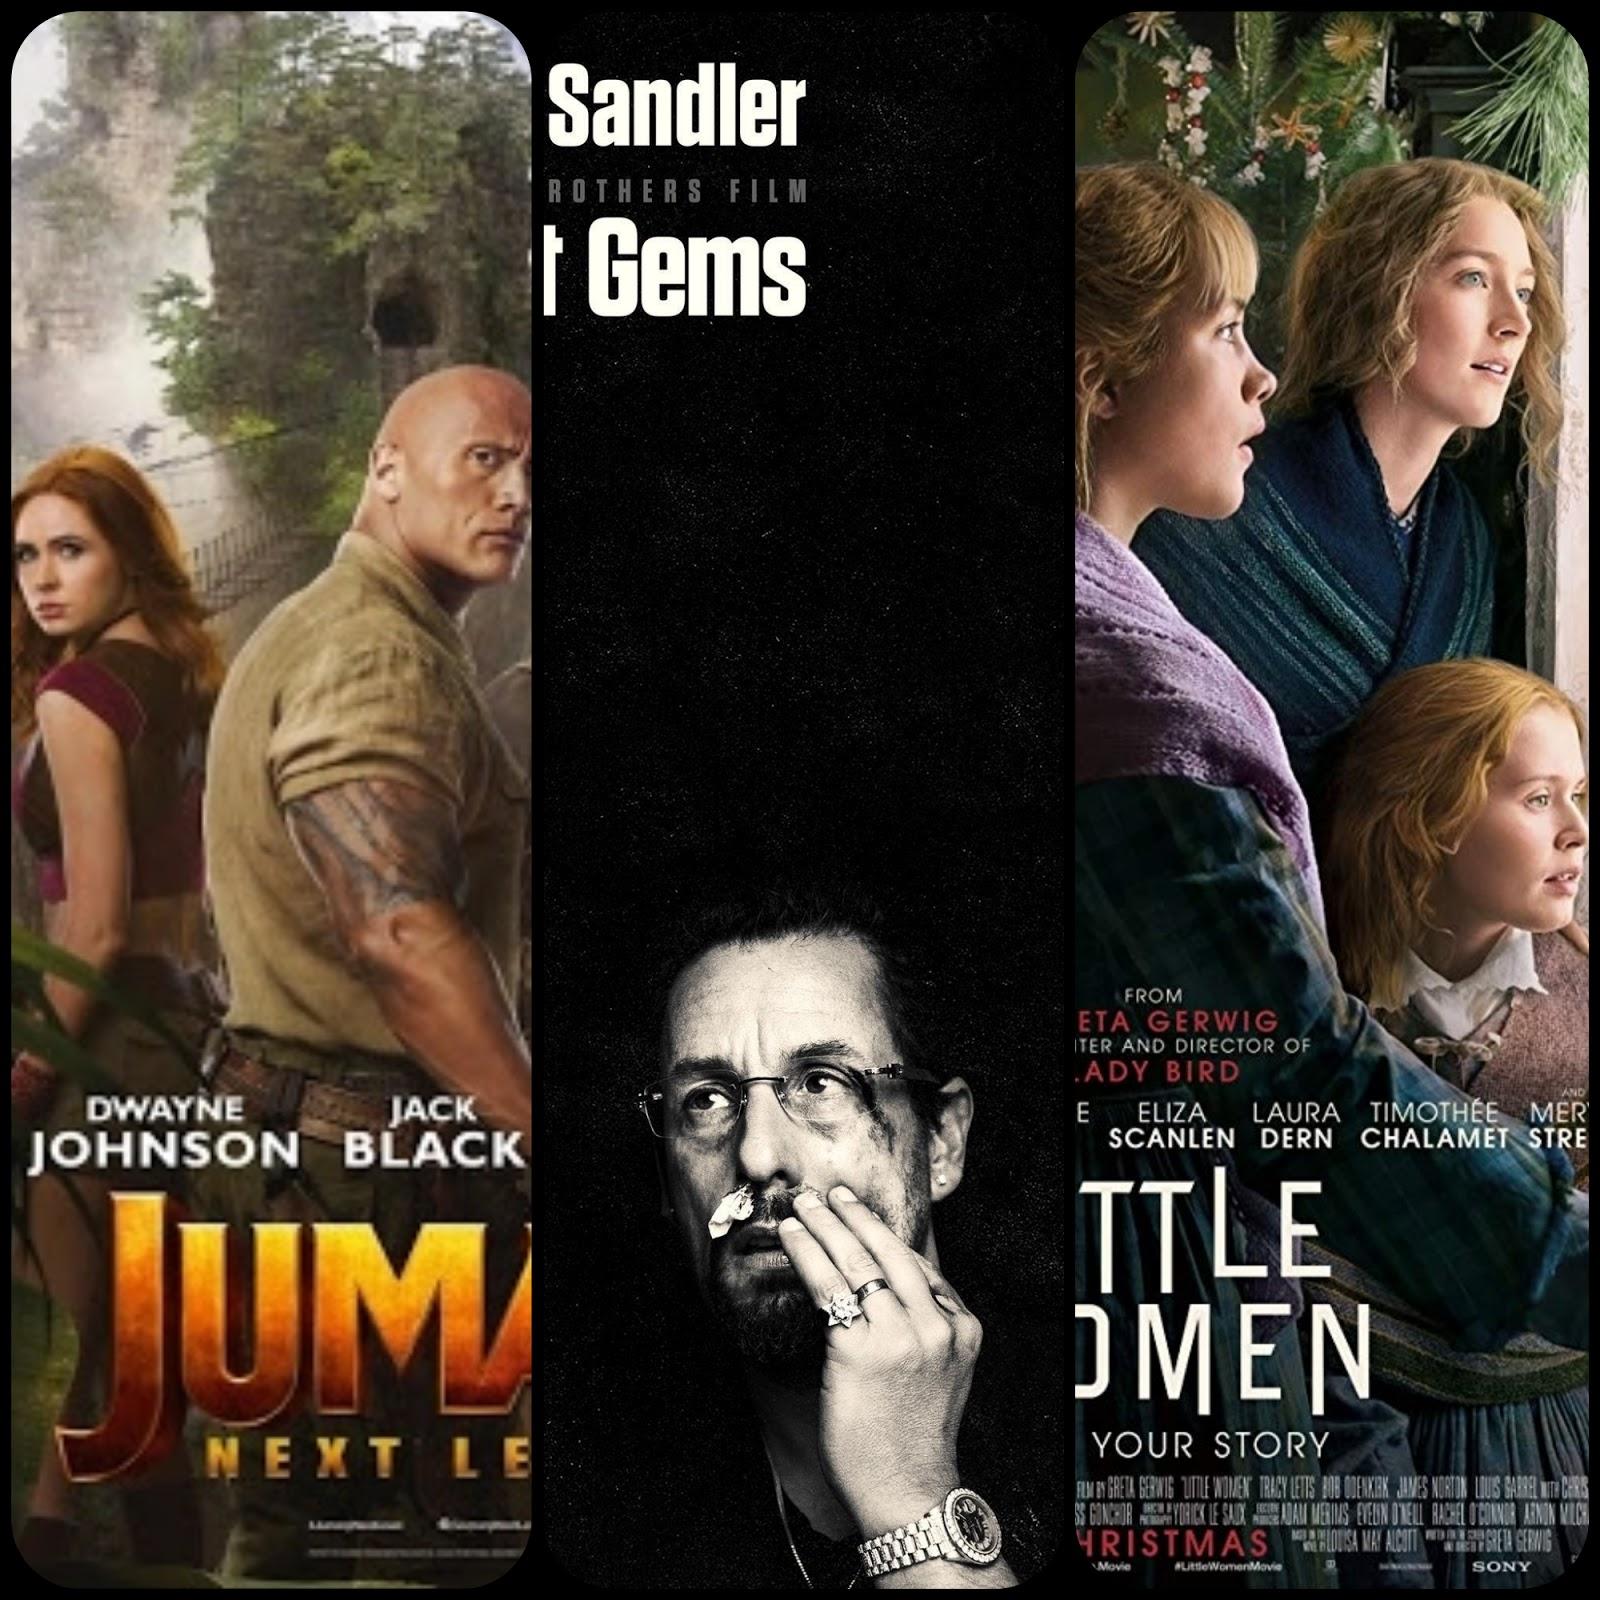 Uh Christmas Break 2020 Two Dollar Cinema: The Dump #4: Christmas Break '19